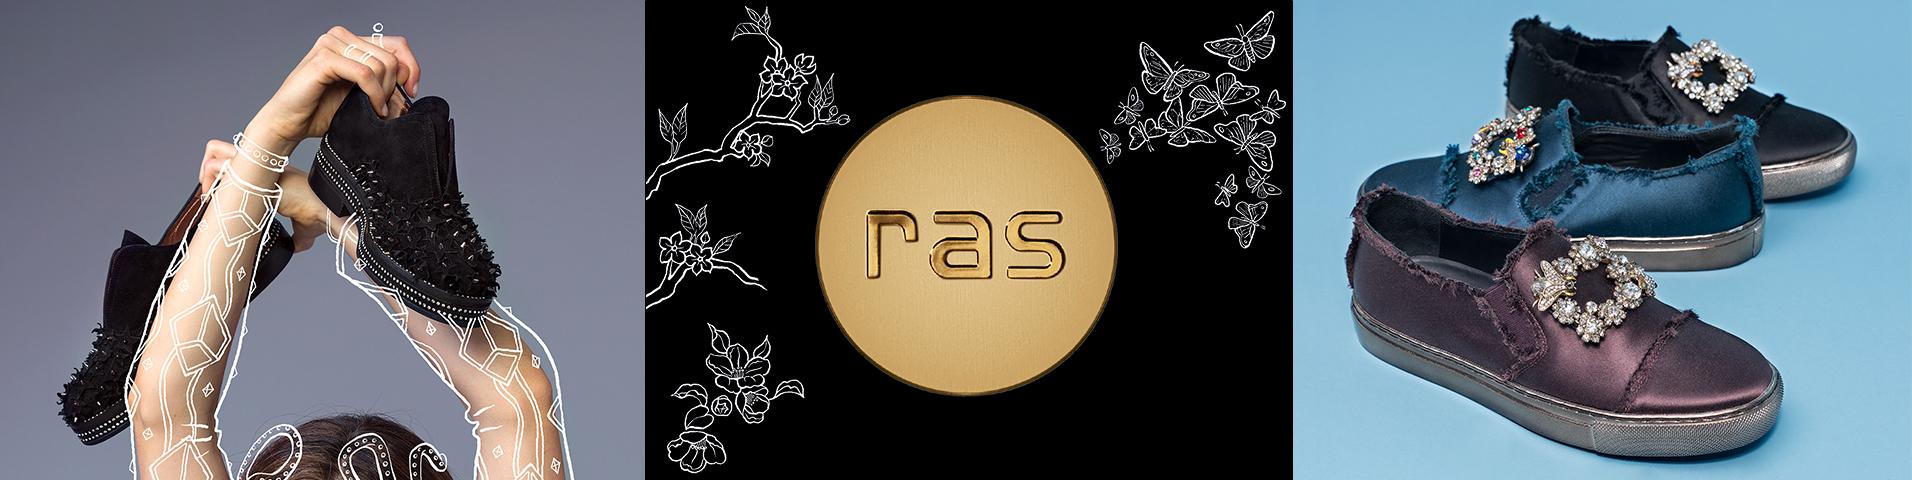 Saldi RAS | Acquista su Zalando